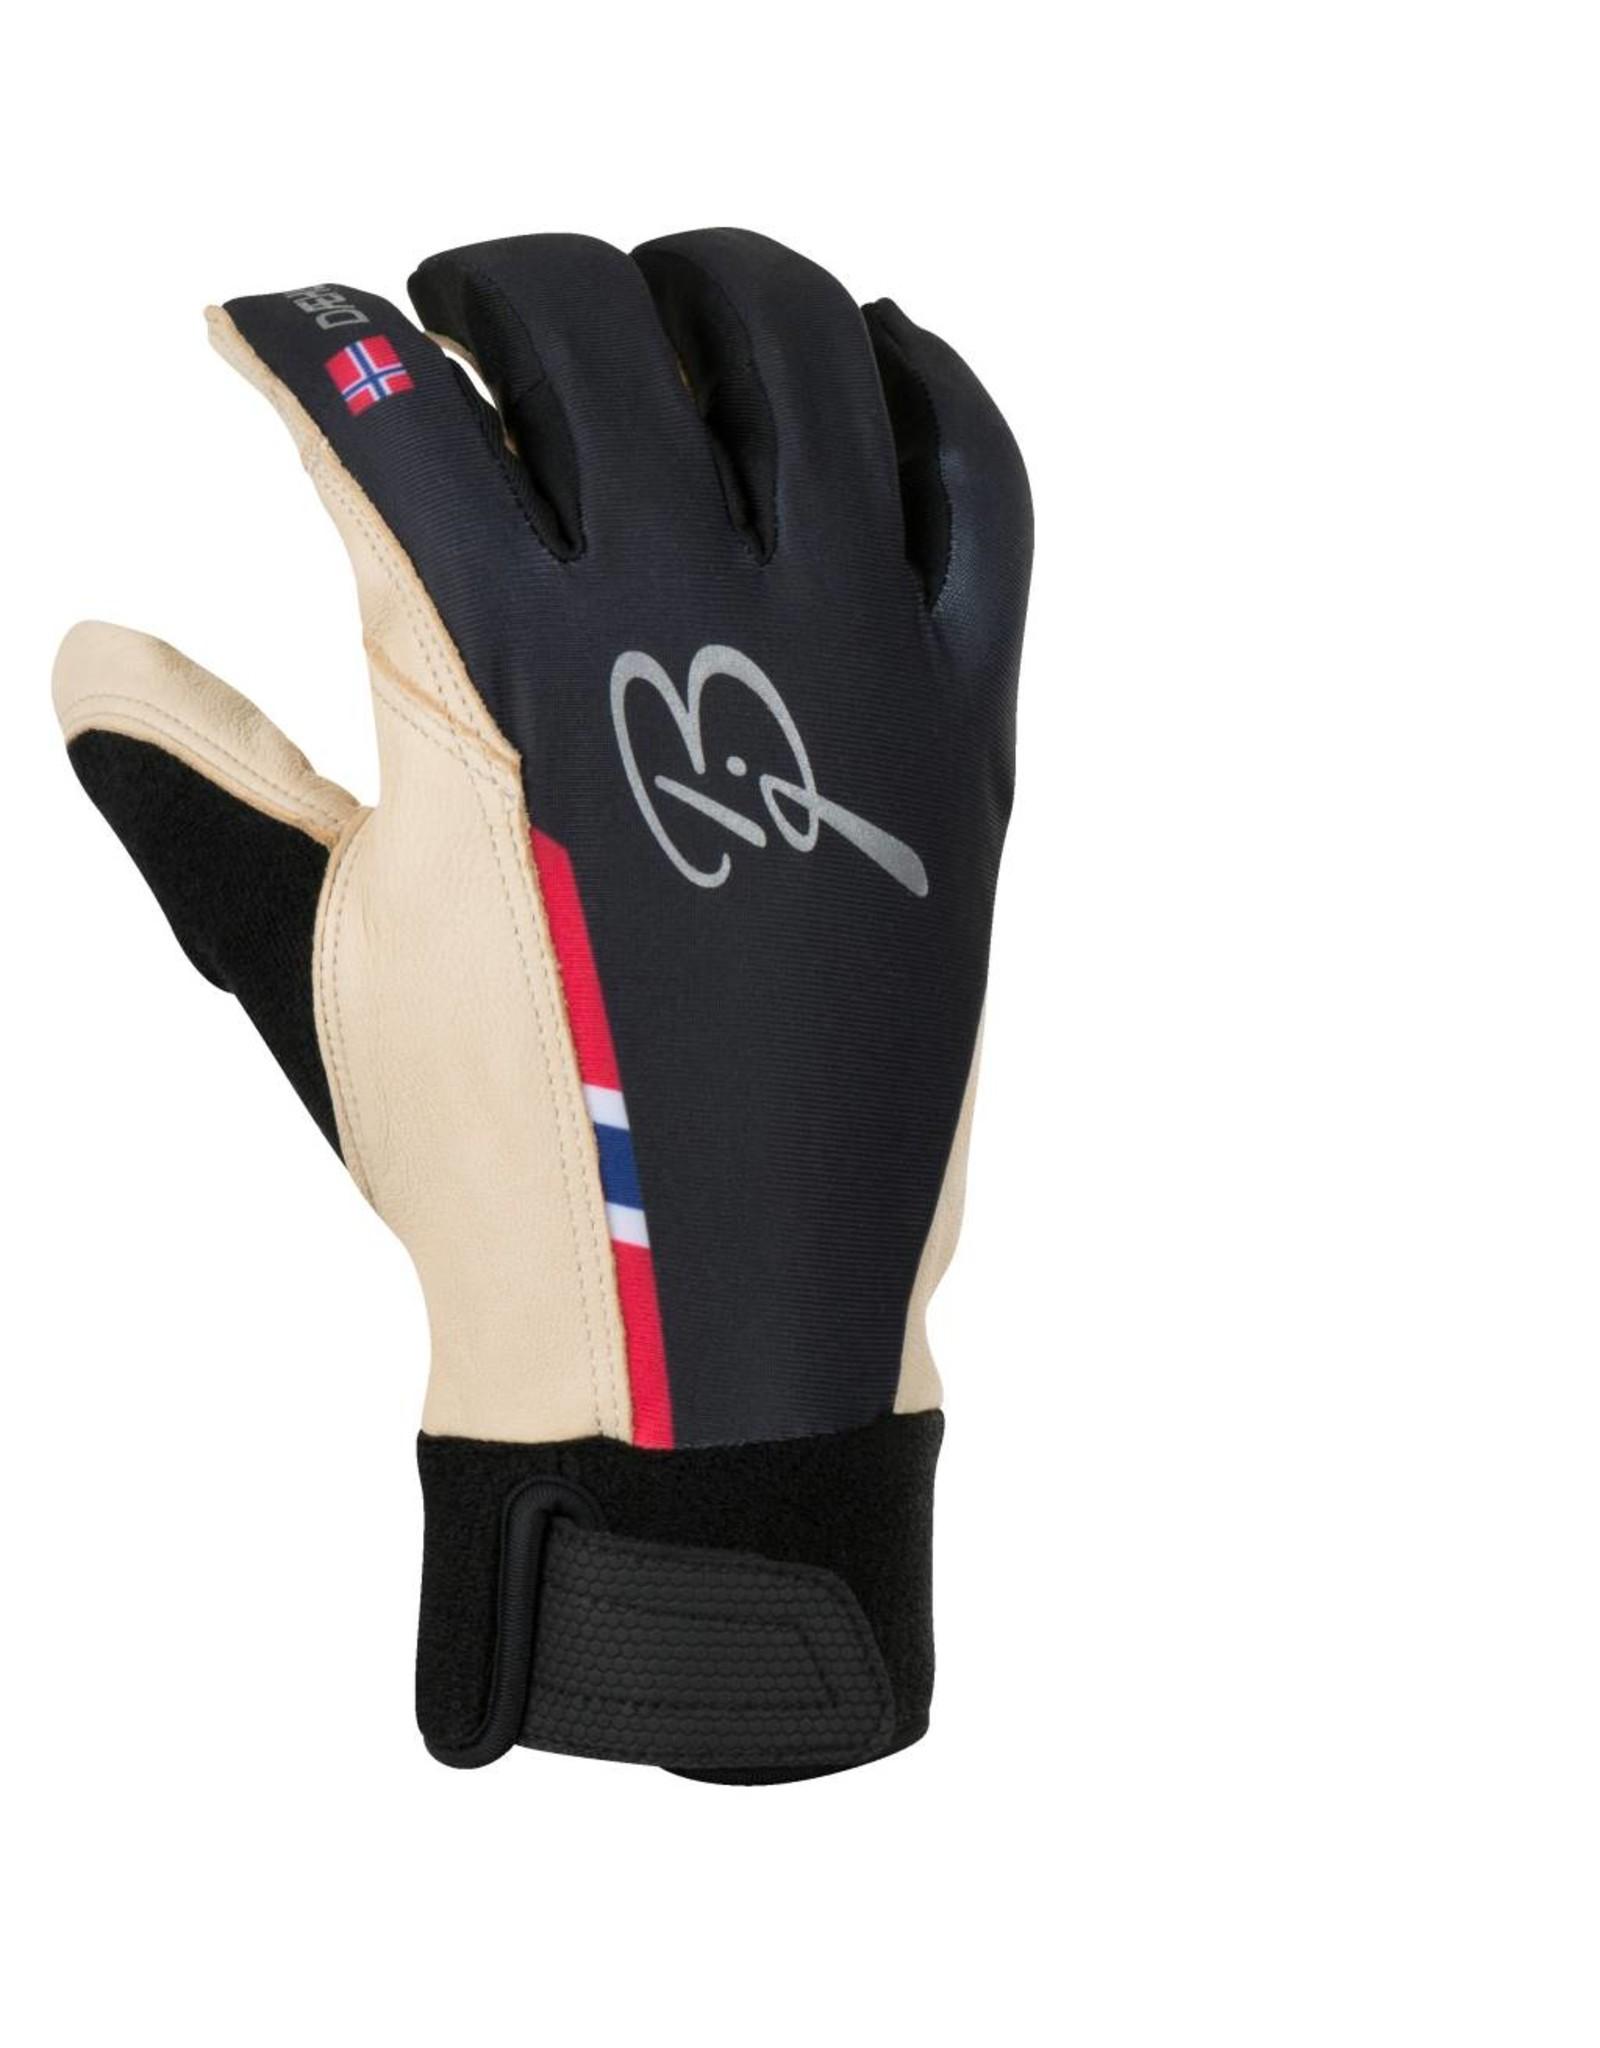 Bjorn Daehlie Race Glove